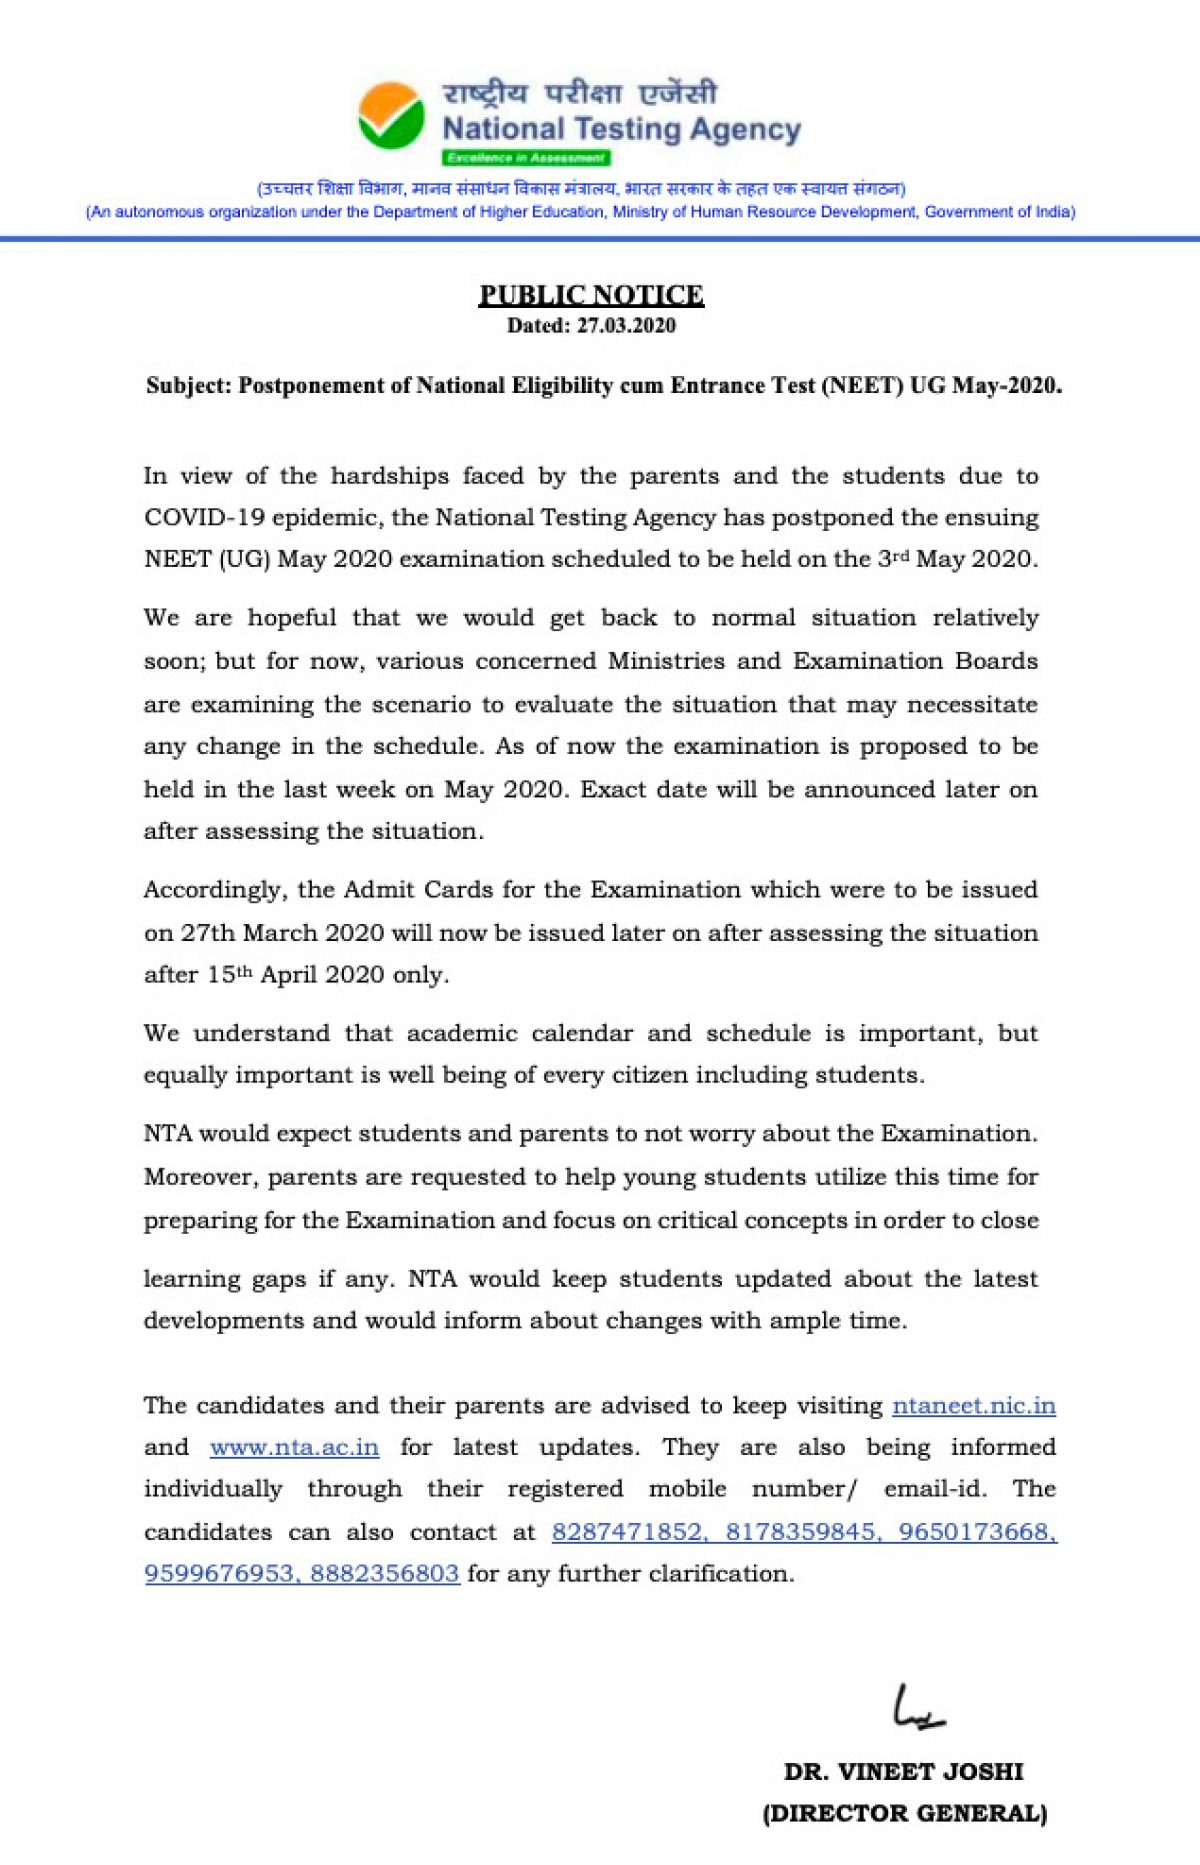 Nta Neet 2020 Exam Postponed Due To Coronavirus Outbreak Kvpy Org In